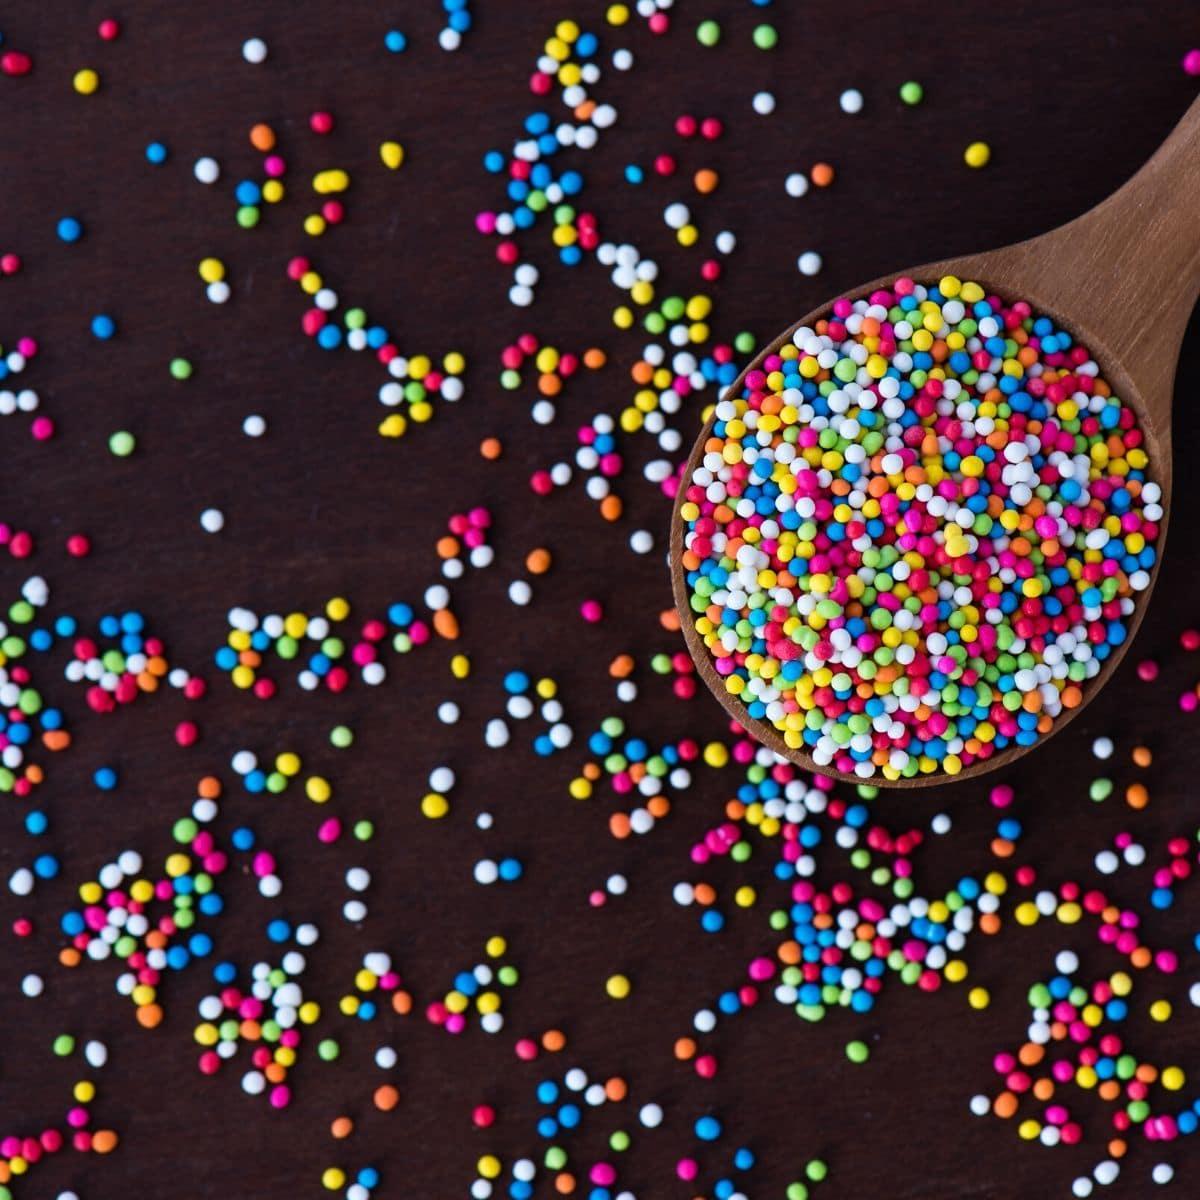 The Best Gluten Free Sprinkles Brands